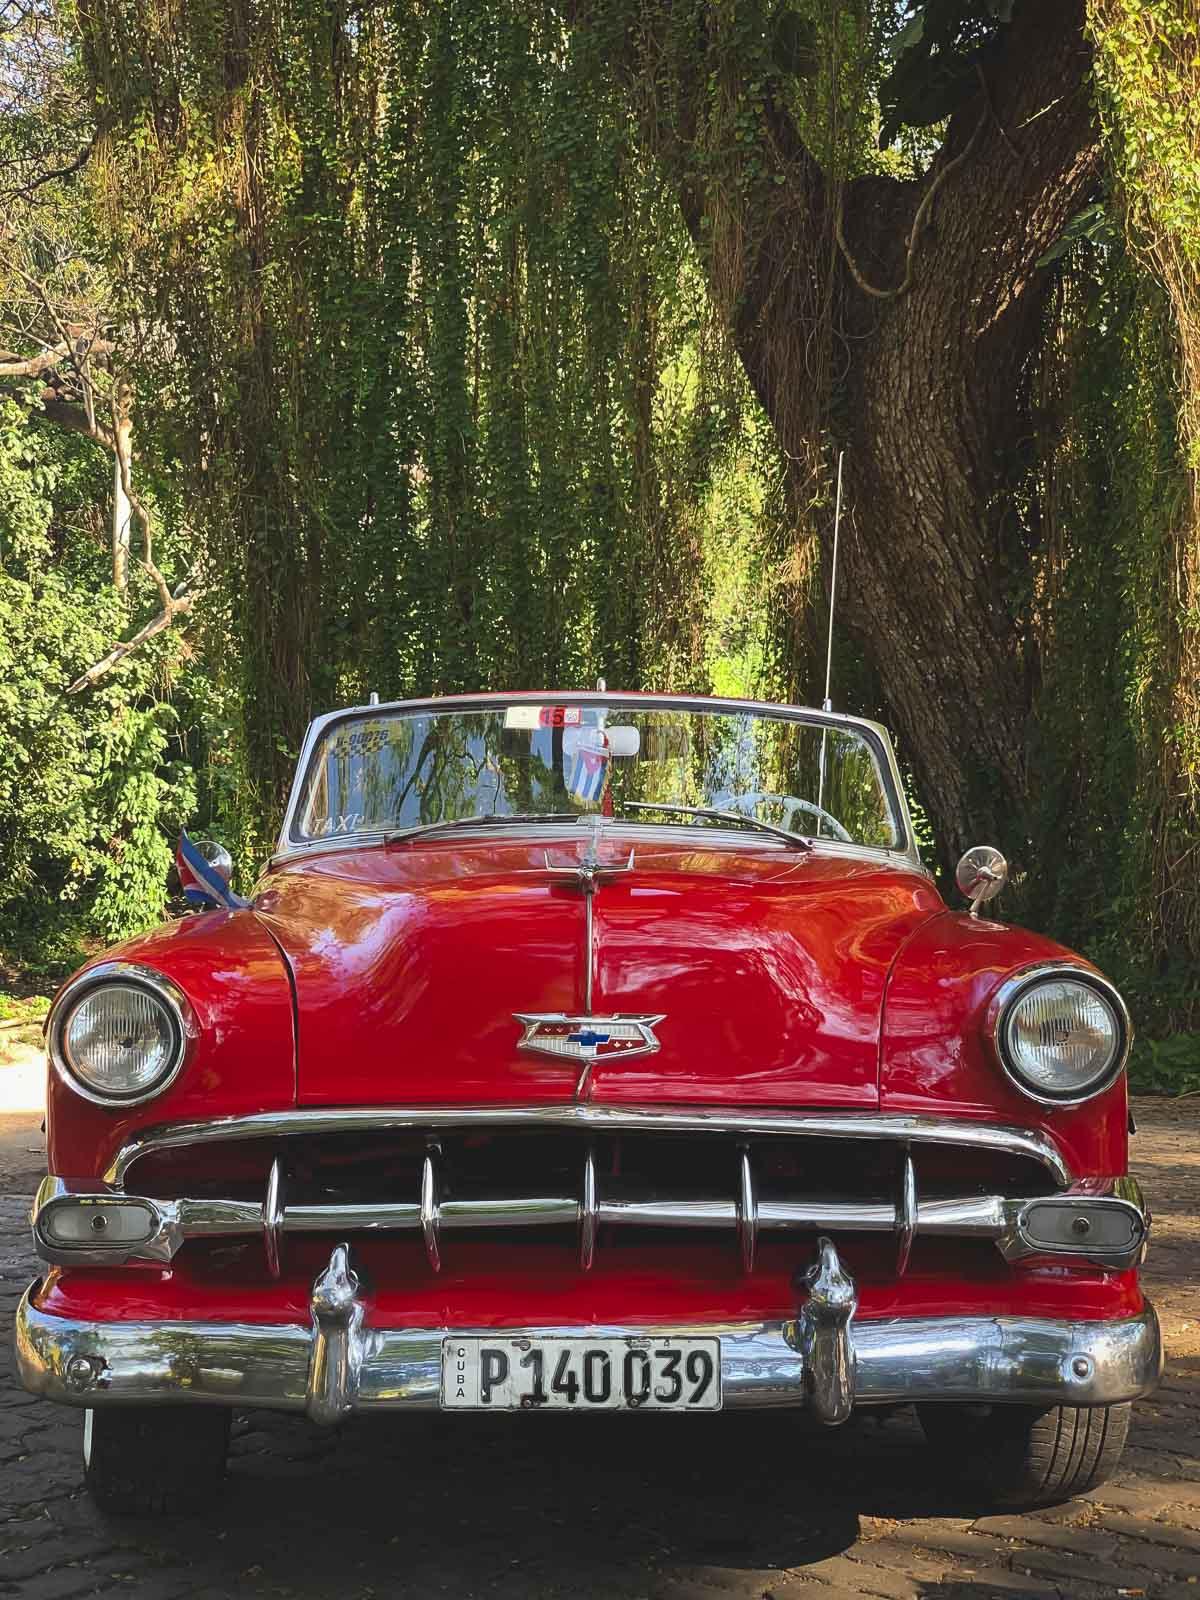 fun facts about cuba - classic red convertible in Havana Cuba